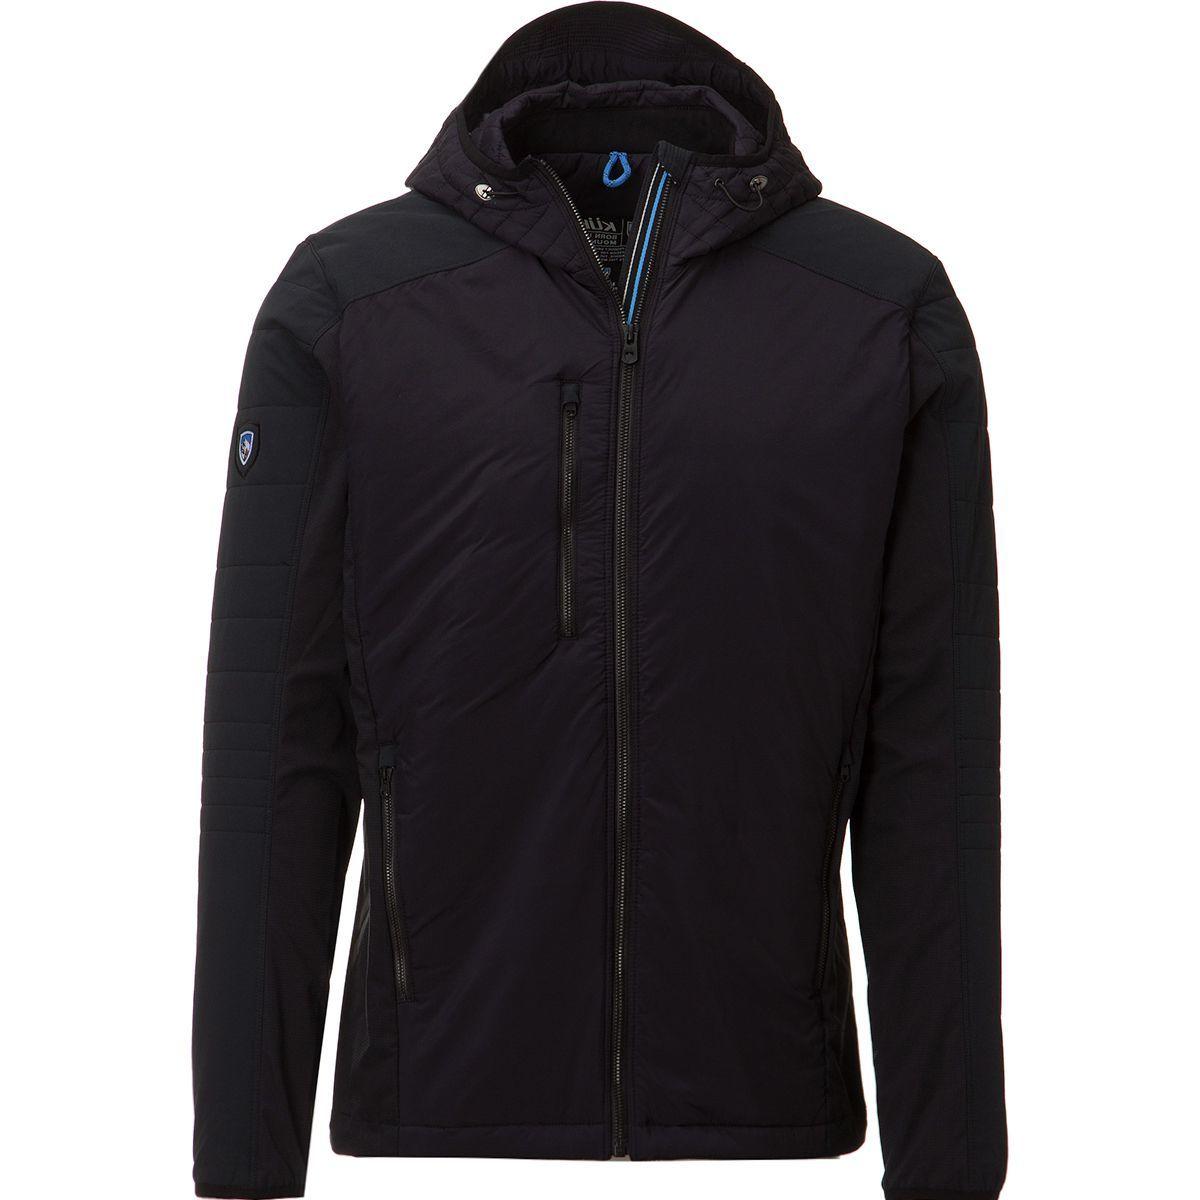 KUHL Wildkard Hybrid Hooded Jacket - Men's